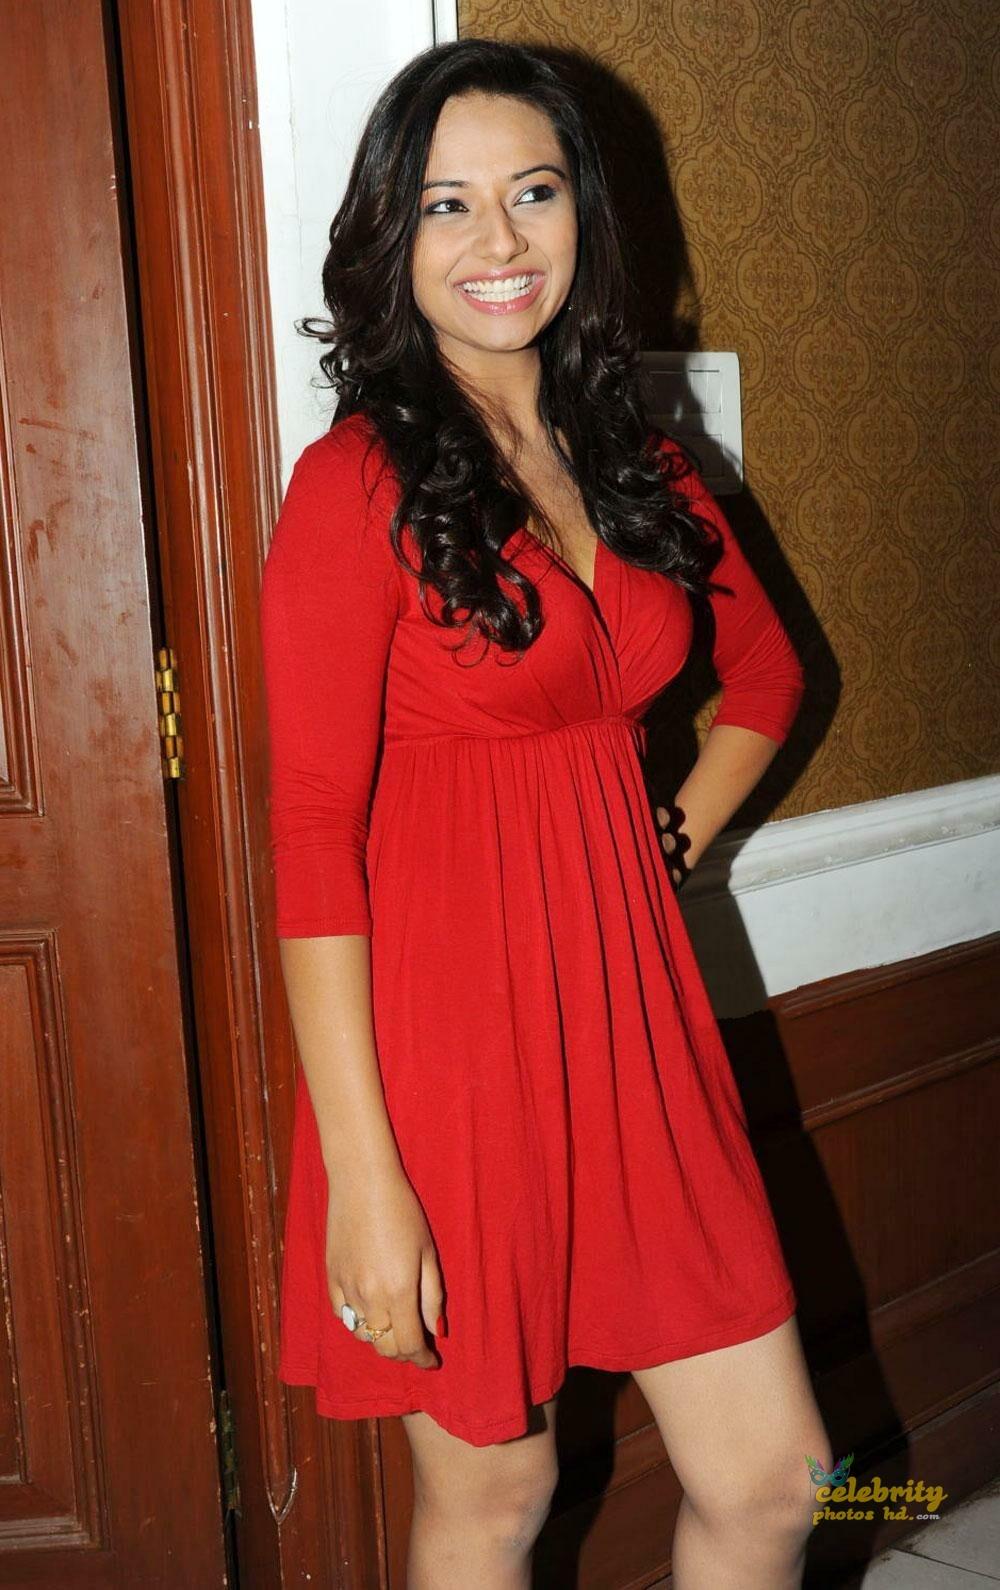 South Indian Super Hot Actress Isha Chawla Photo (1)